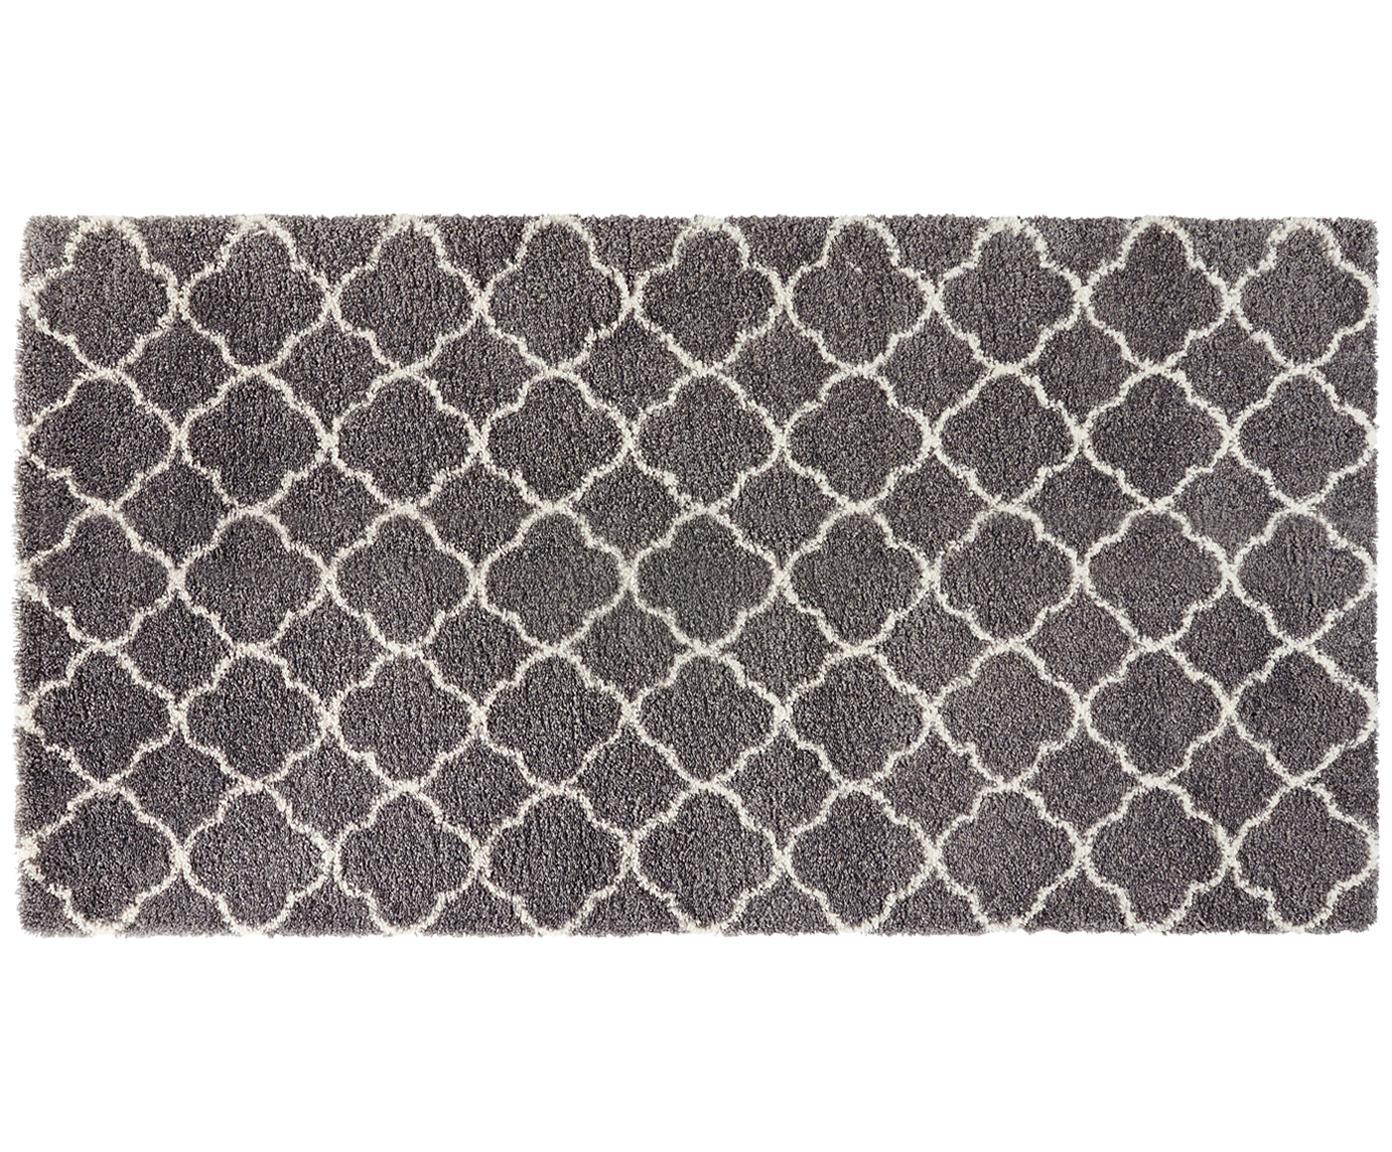 Hochflor-Teppich Grace in Dunkelgrau/Creme, Flor: 100% Polypropylen, Dunkelgrau, Creme, B 80 x L 150 cm (Größe XS)